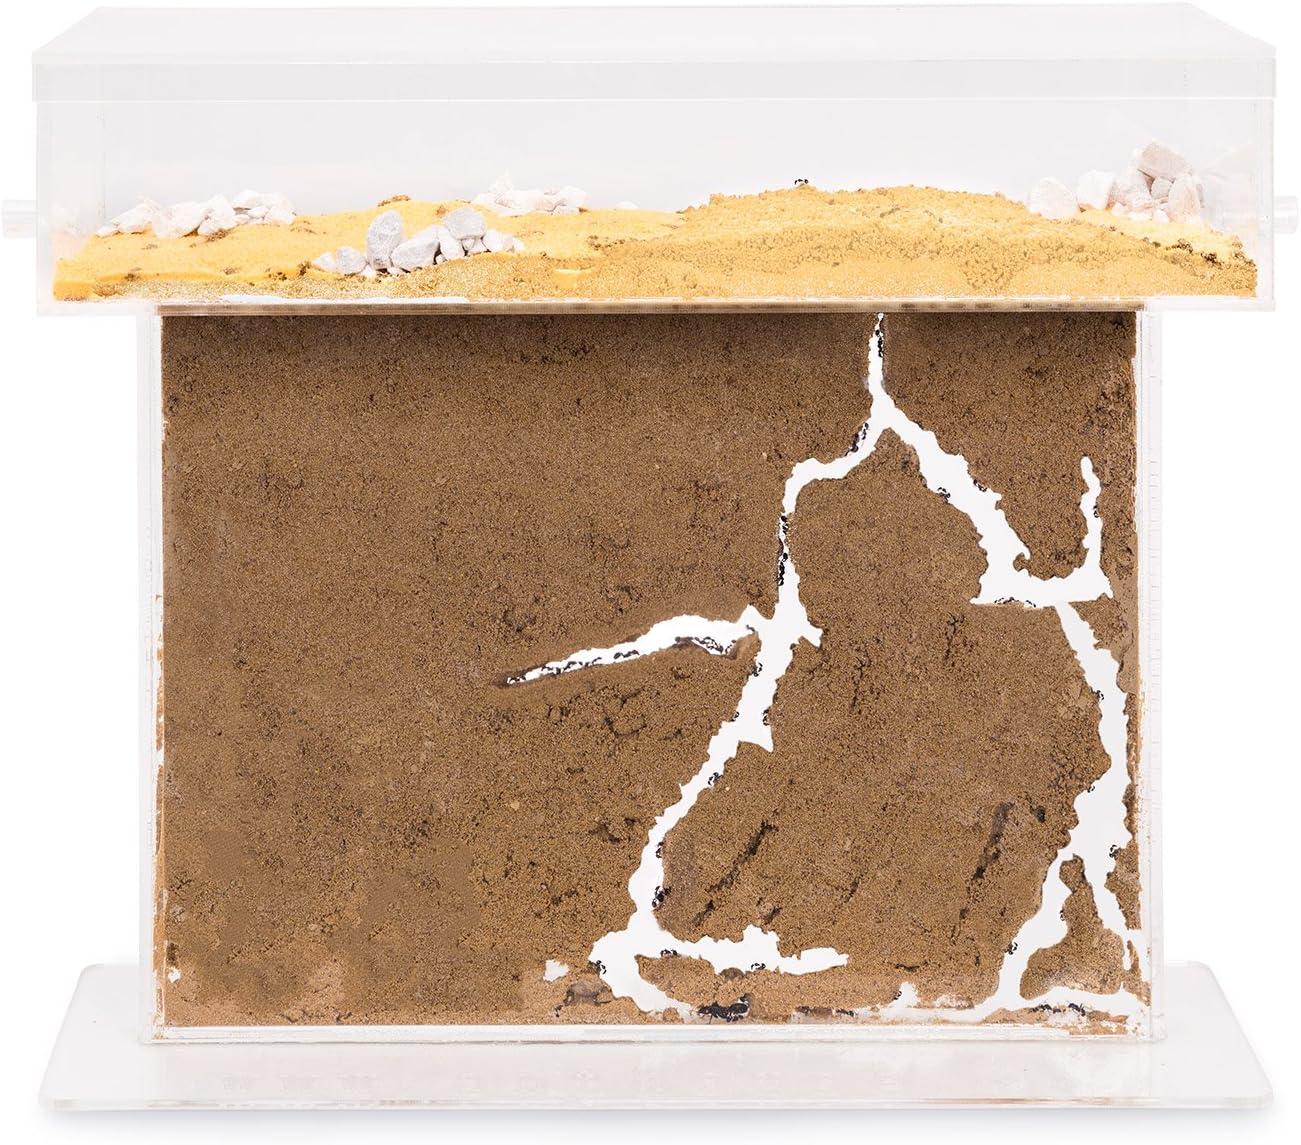 Sand Ant Farm Basic Anthill, Formicarium, Educational, Ants